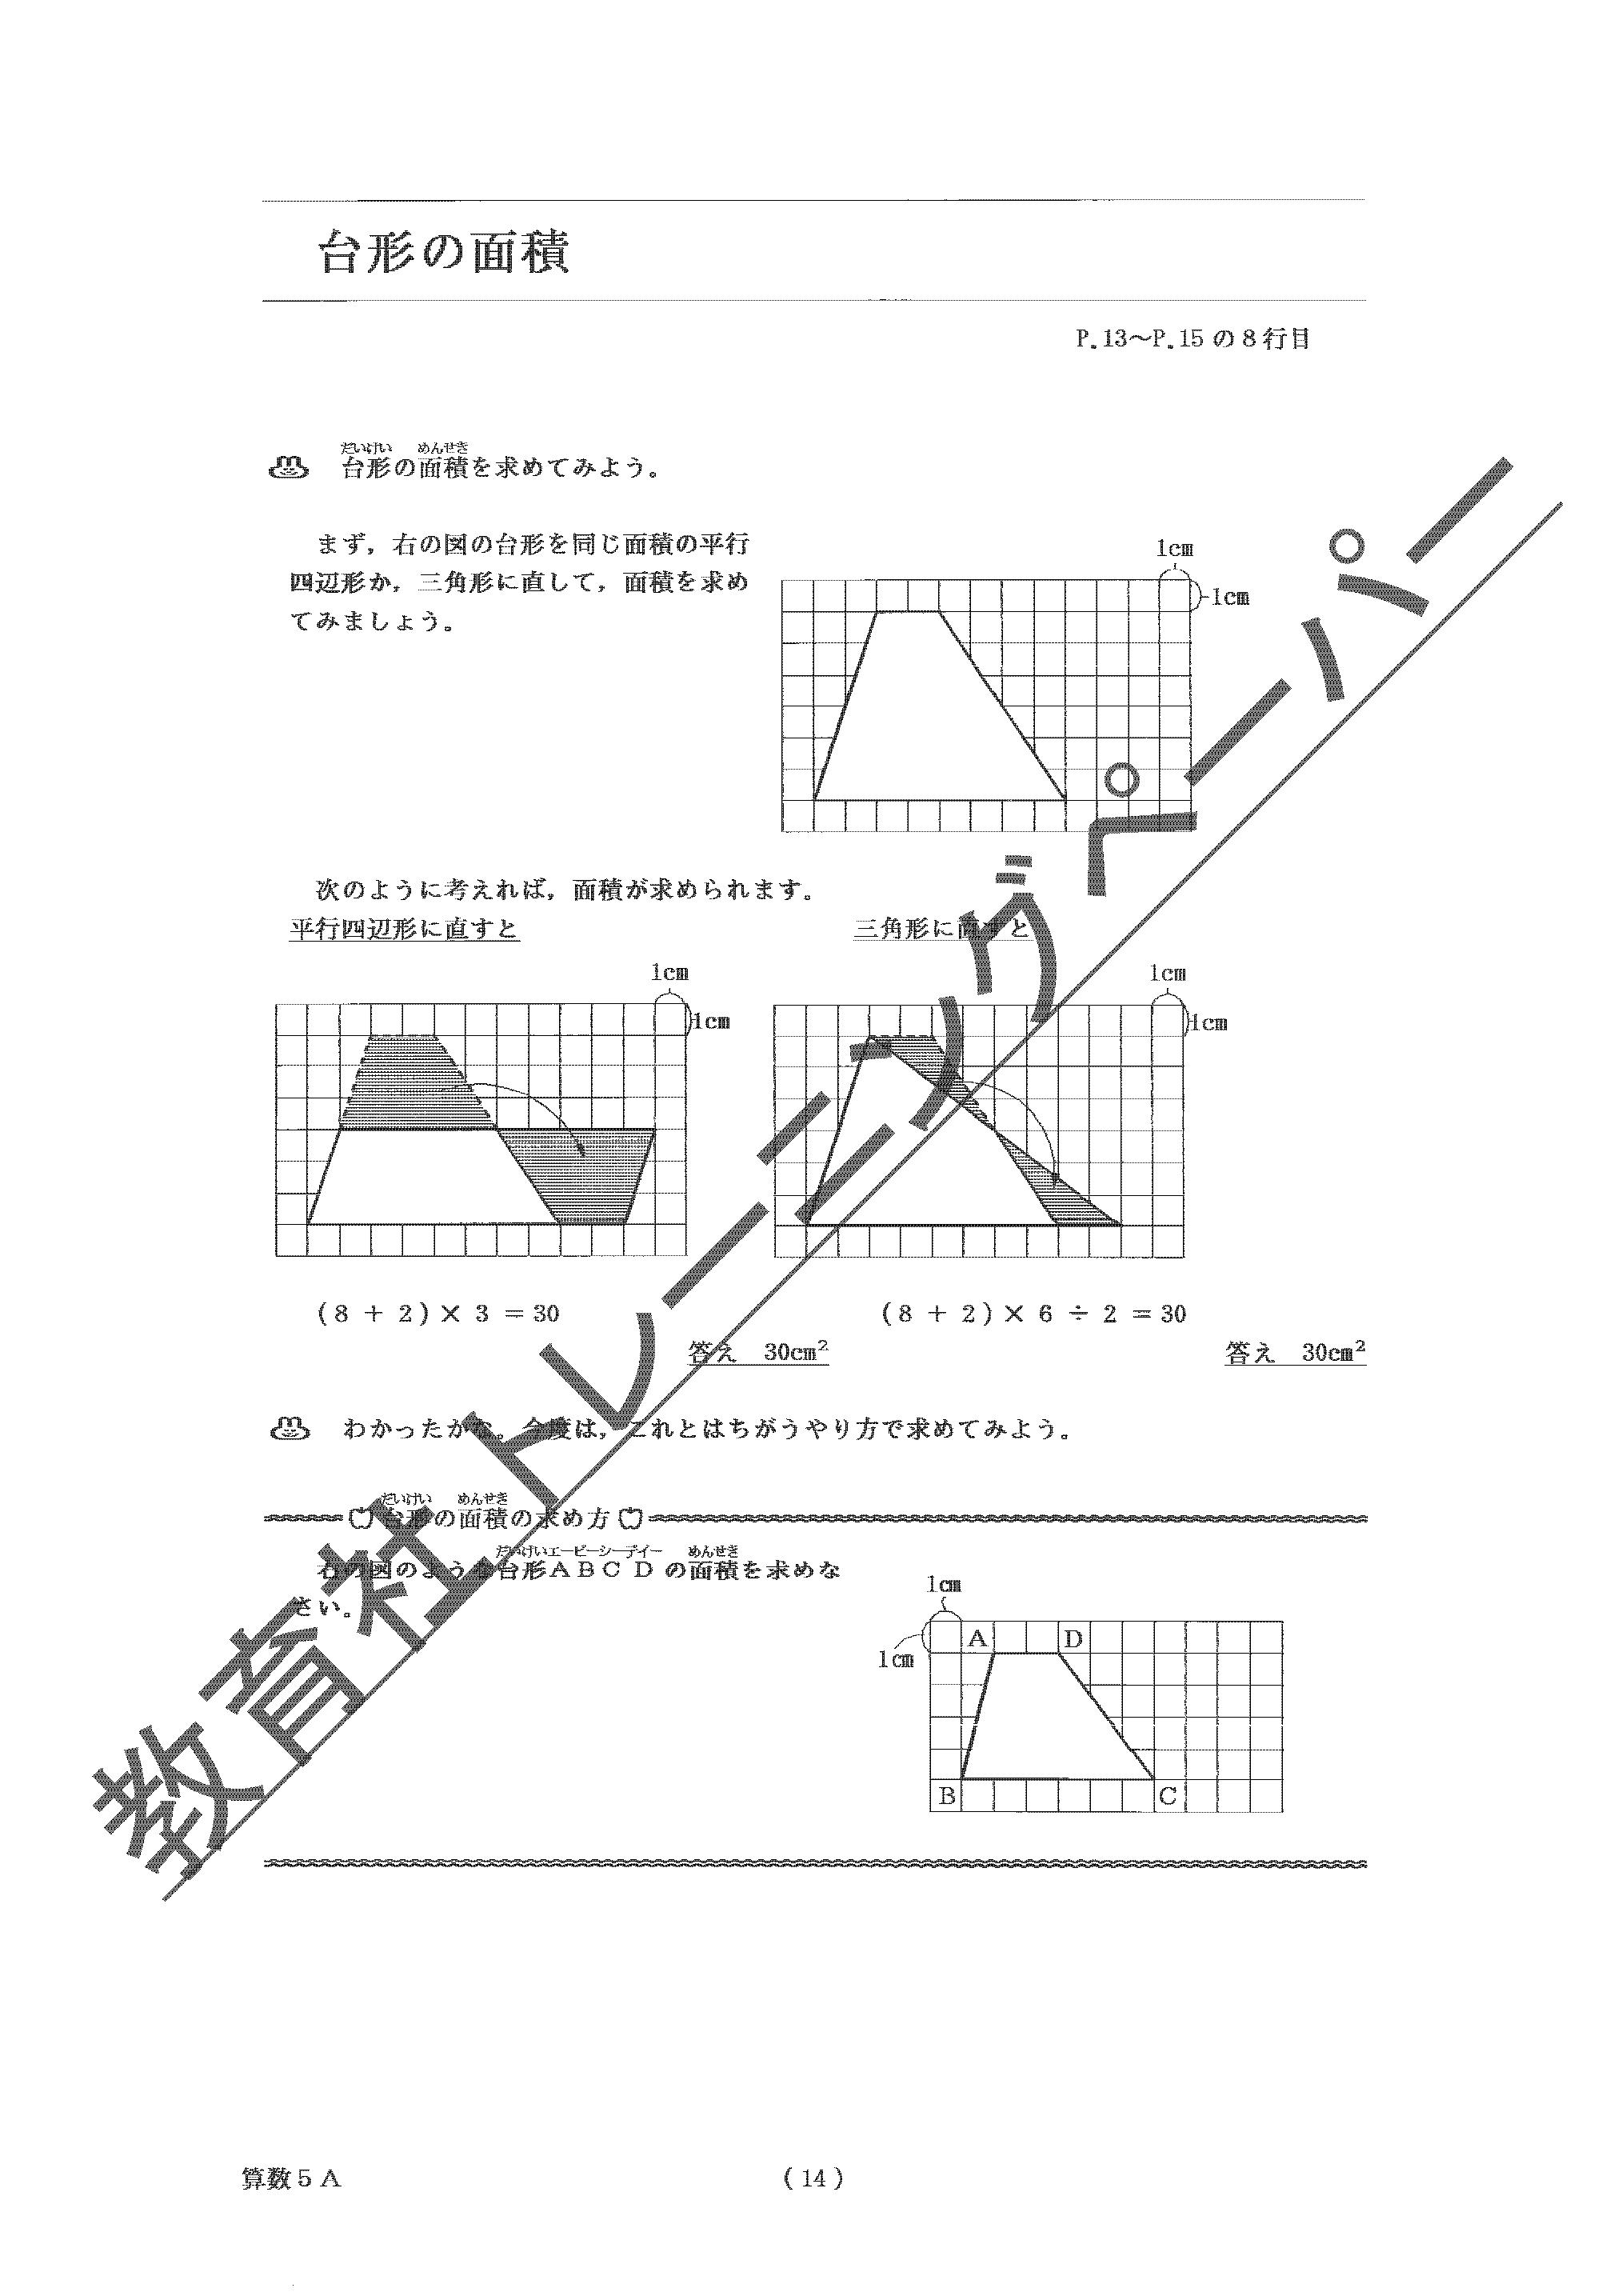 ITEM-S5SANSU-011